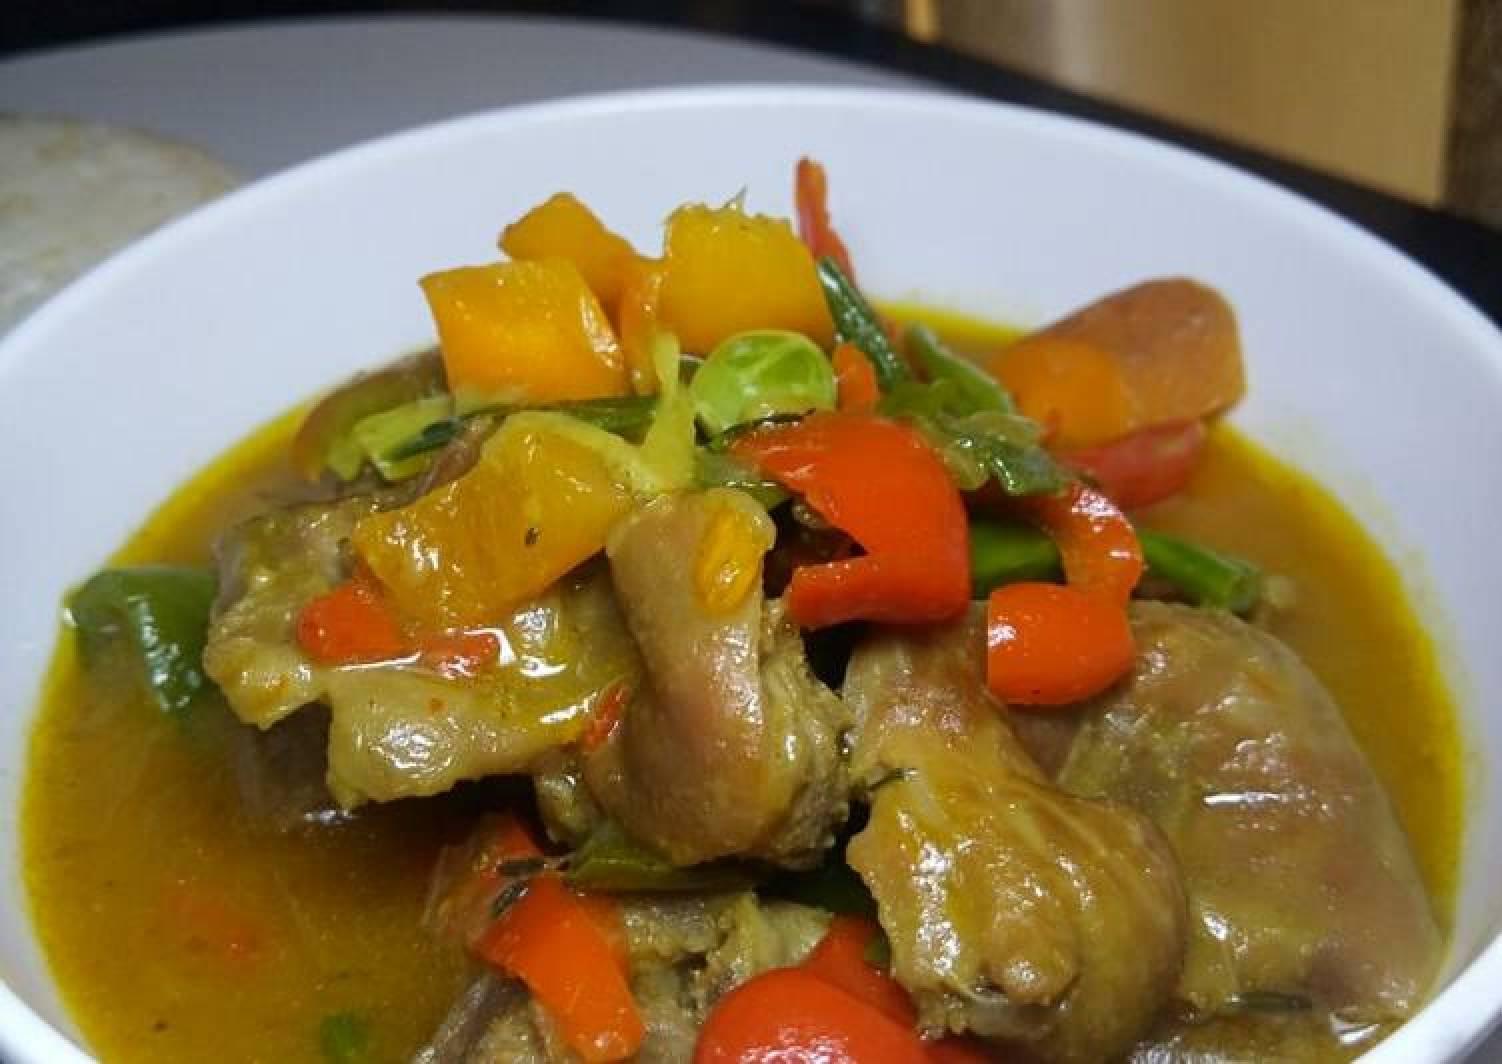 Gizveg chilli sauce